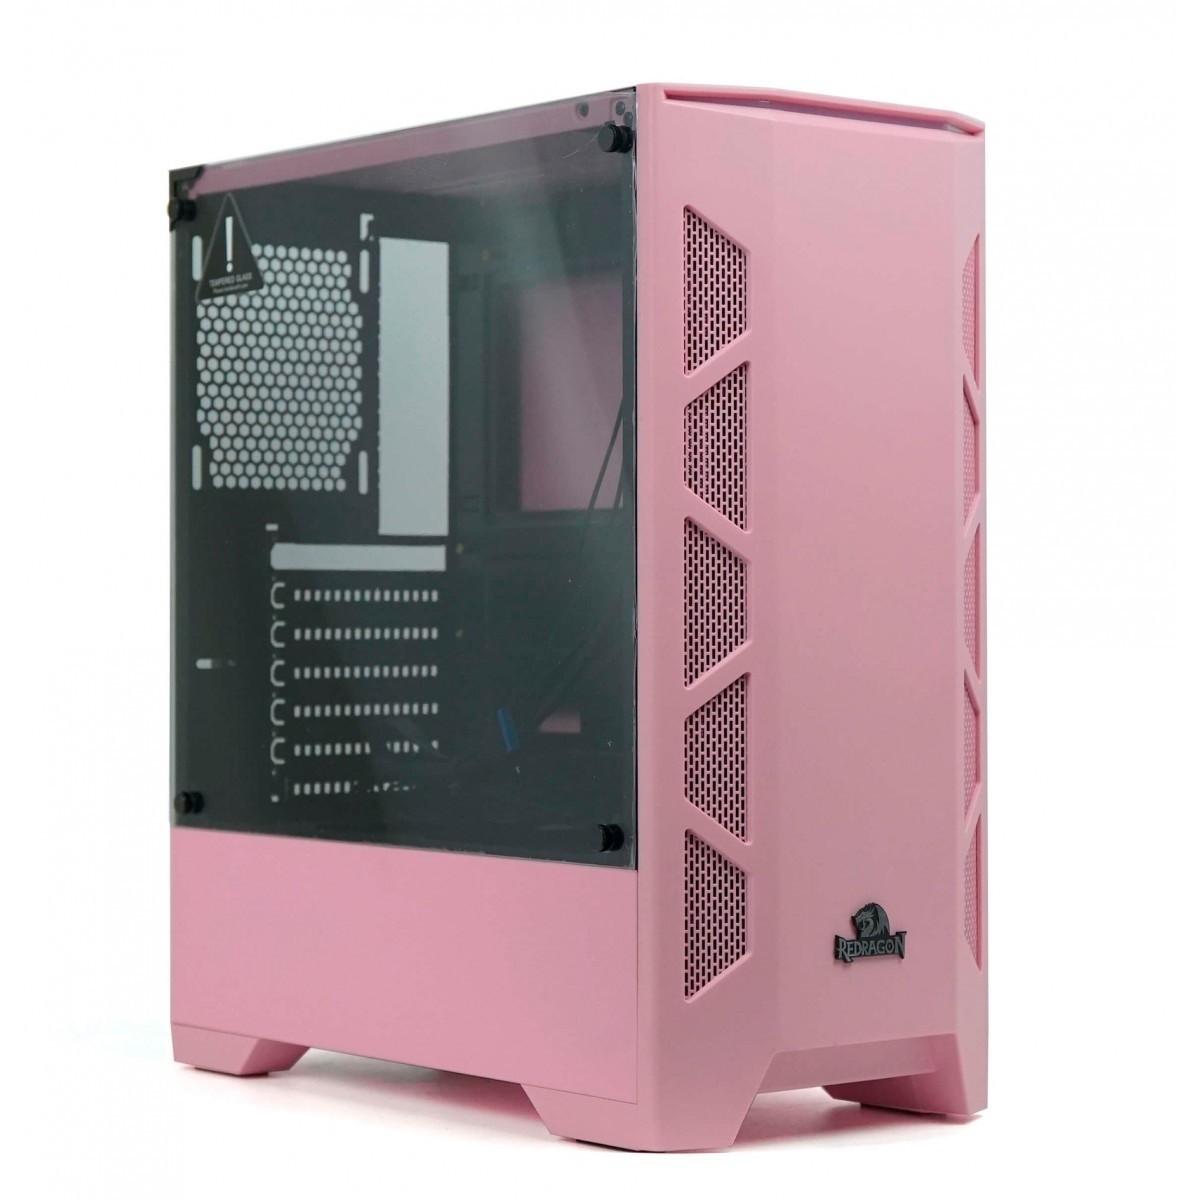 Computador Gamer, RYZEN 3 2200G 3.5Ghz , VIdeo Vega 8, 8GB DDR4, HD 1TB